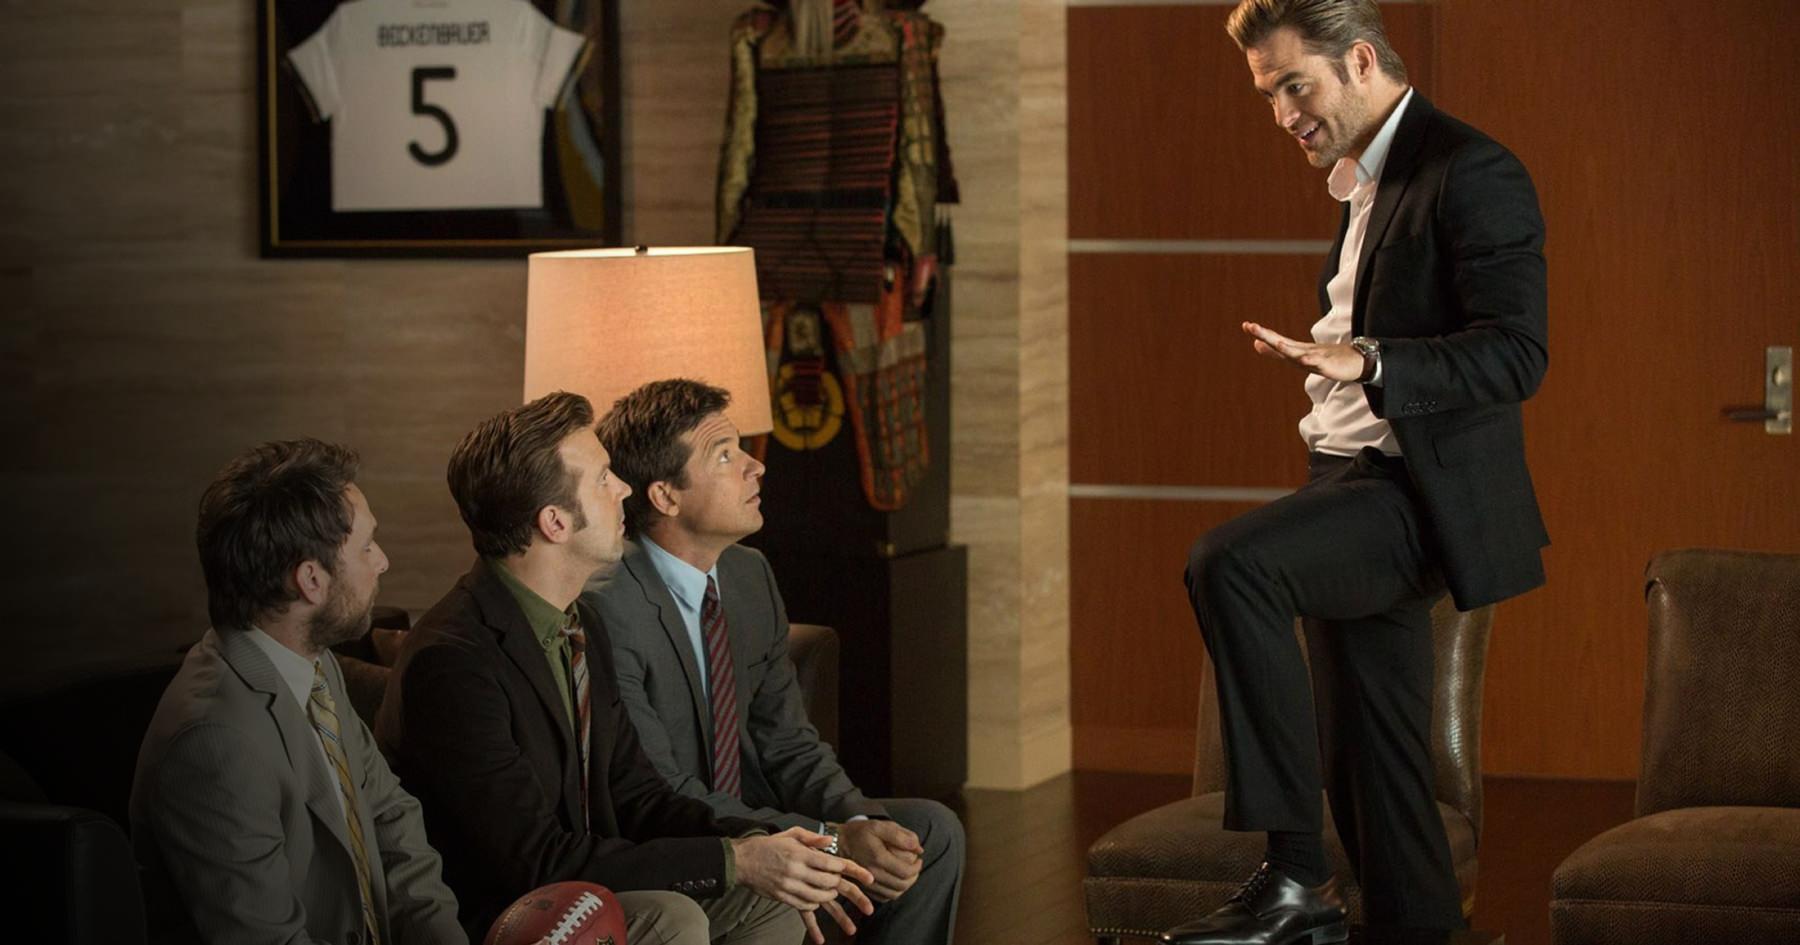 Charlie Day, Jason Sudeikis and Jason Bateman in Horrible Bosses 2